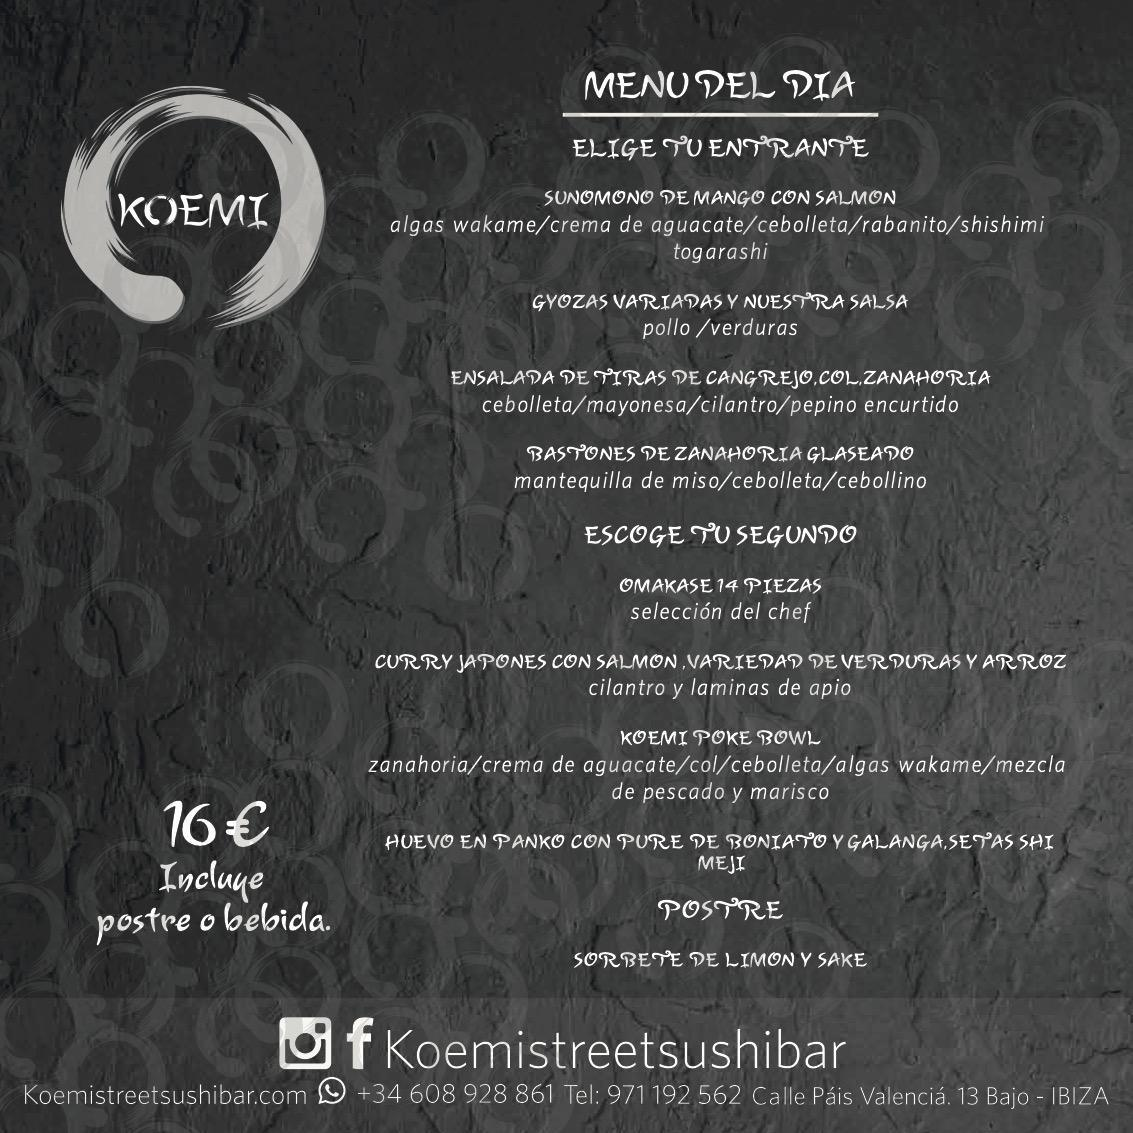 Koemi Street Sushi Bar